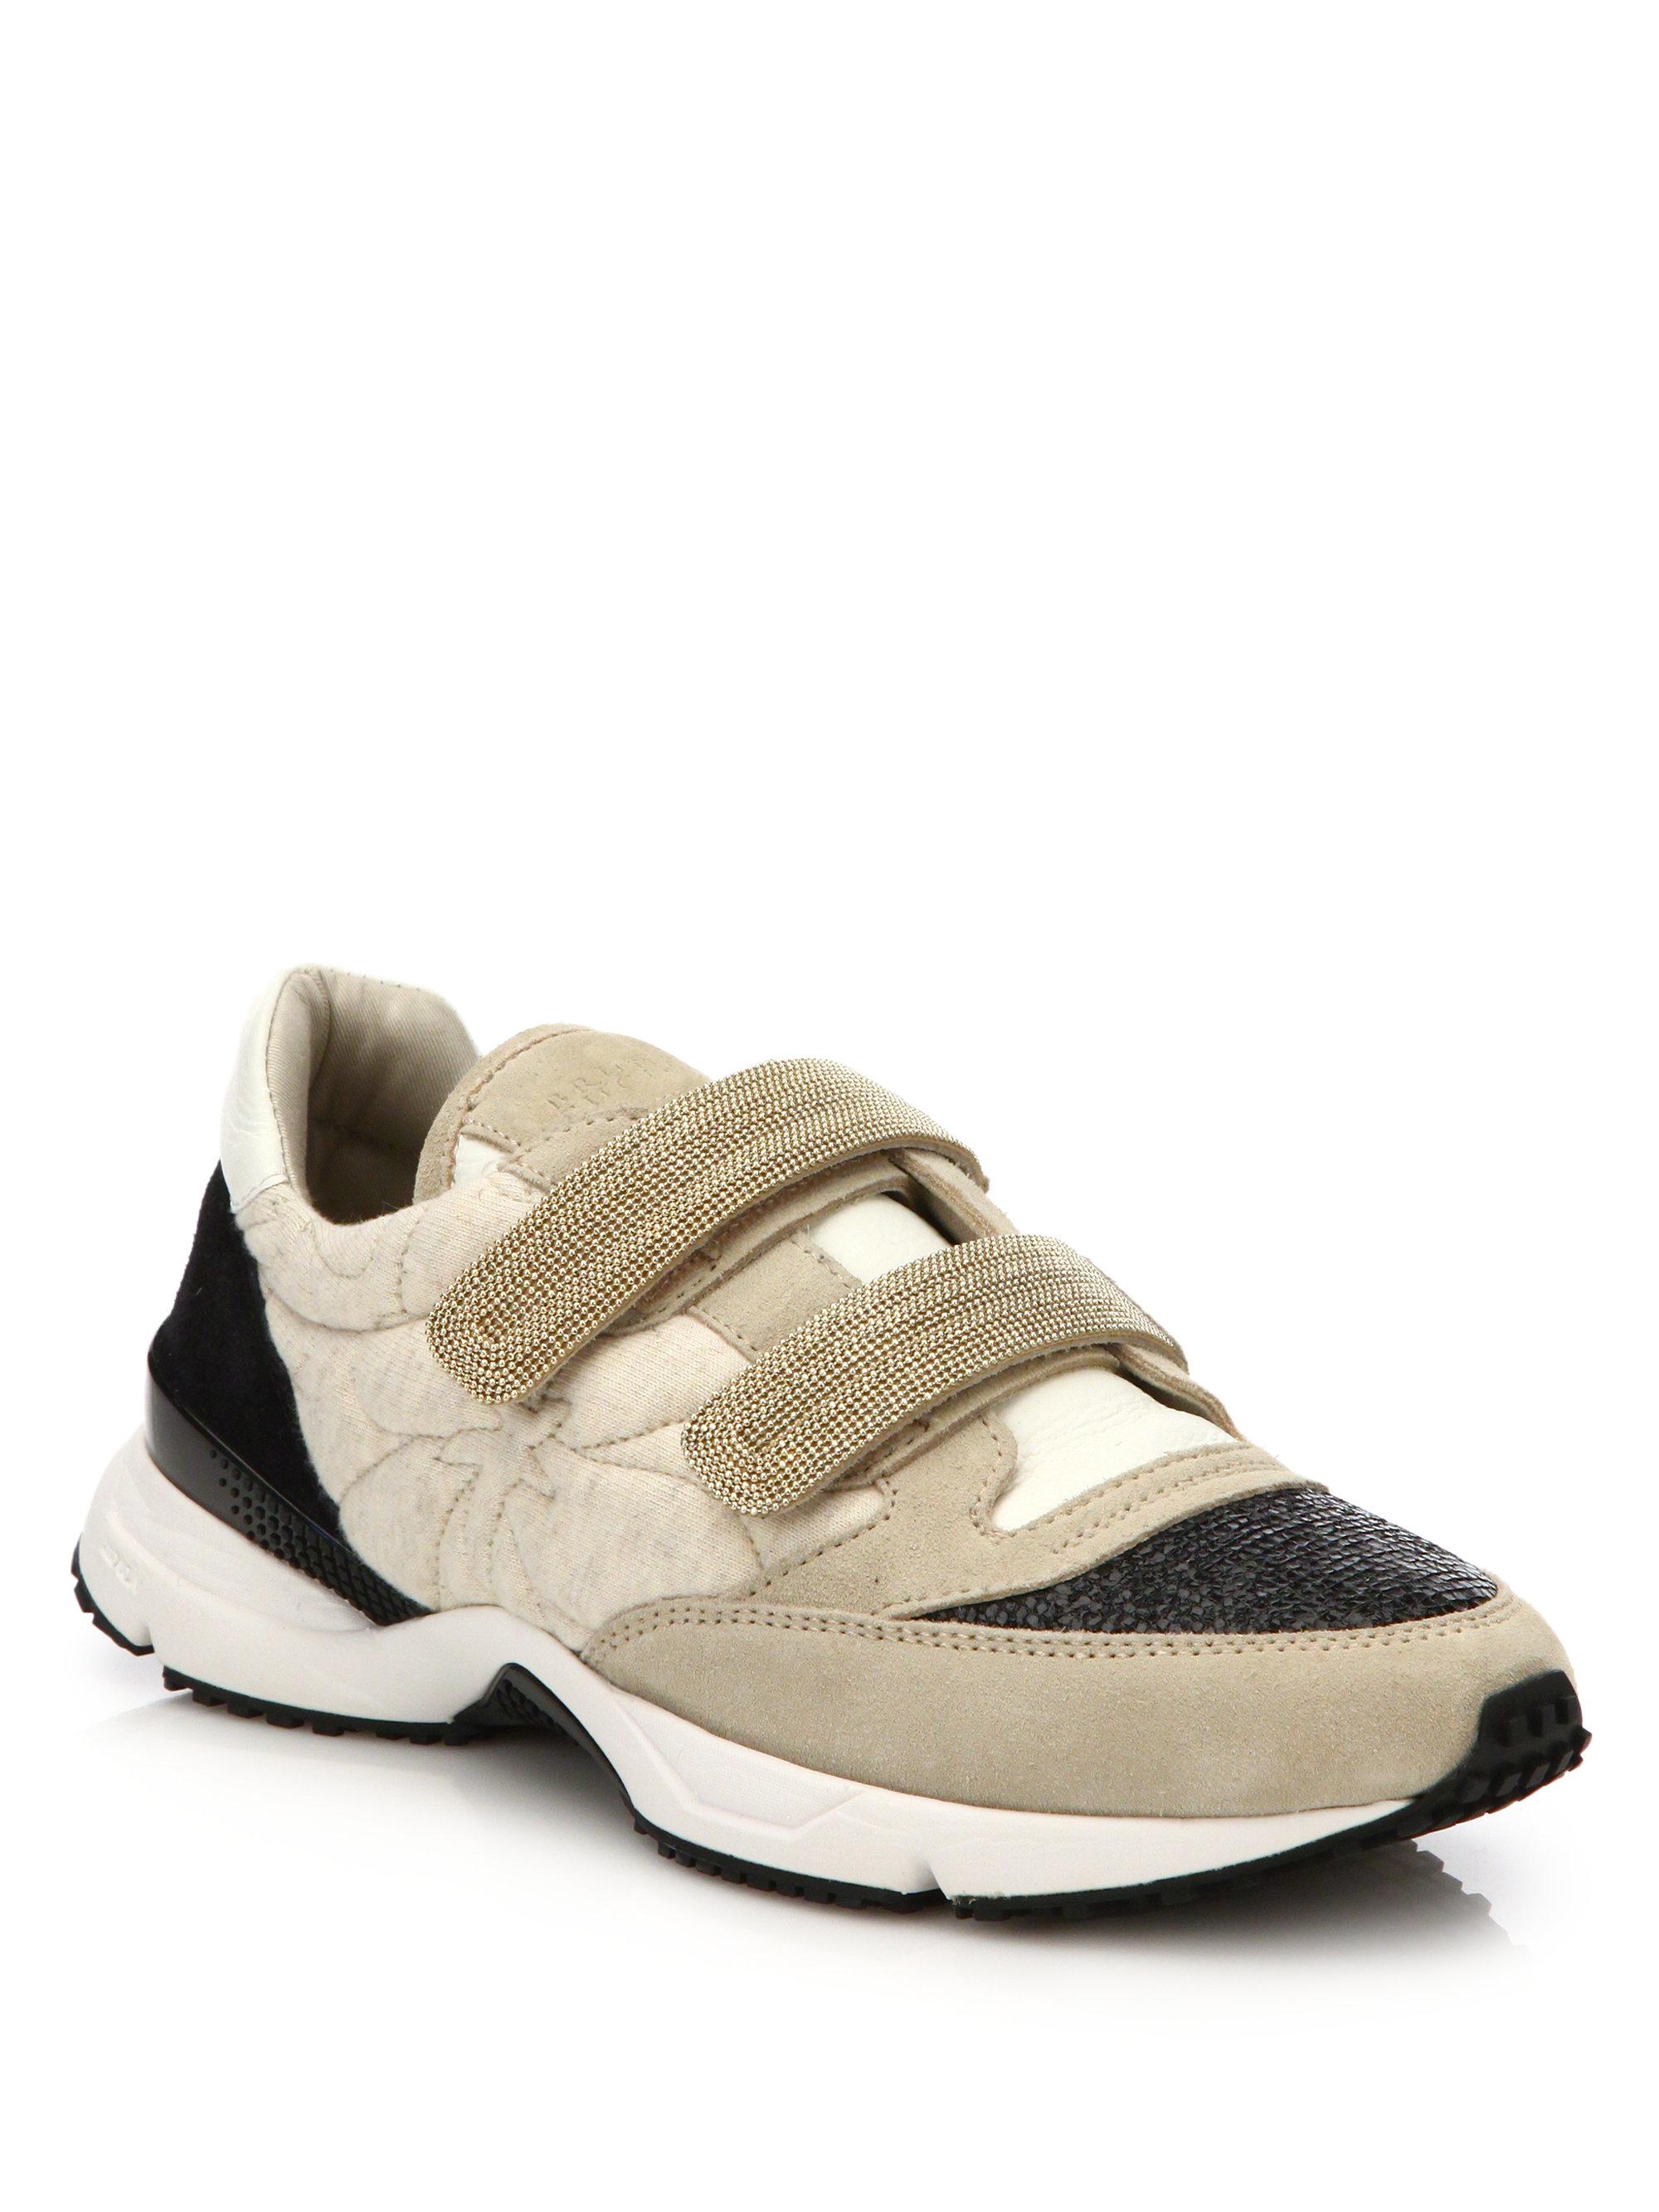 with credit card for sale Brunello Cucinelli Monili Strap Sneakers cheapest price eNdMFBxD